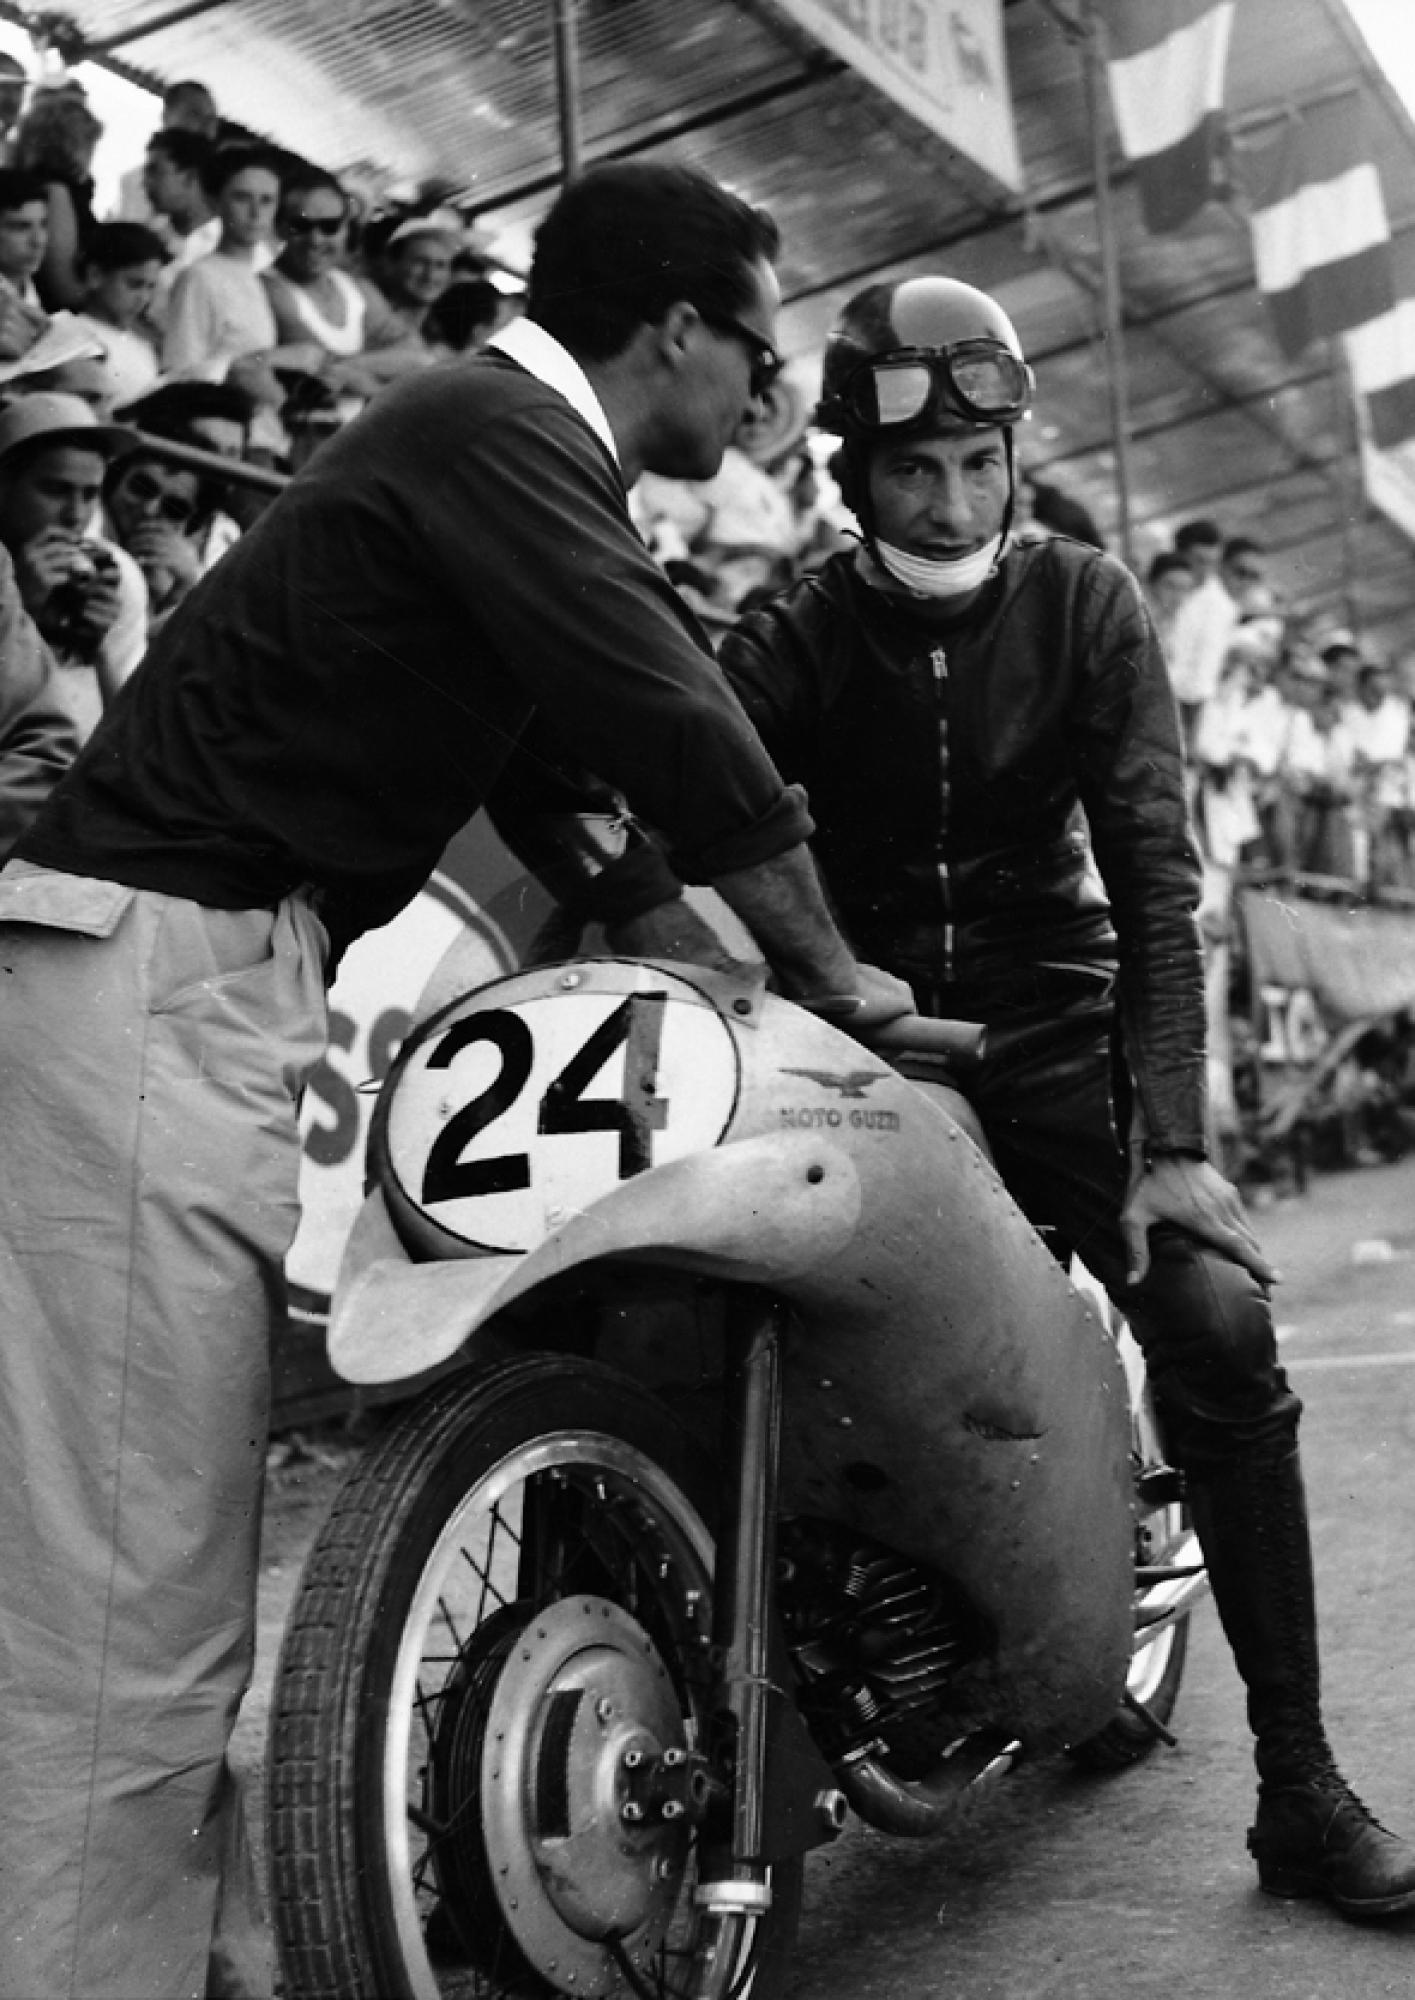 Moto Guzzi on the track